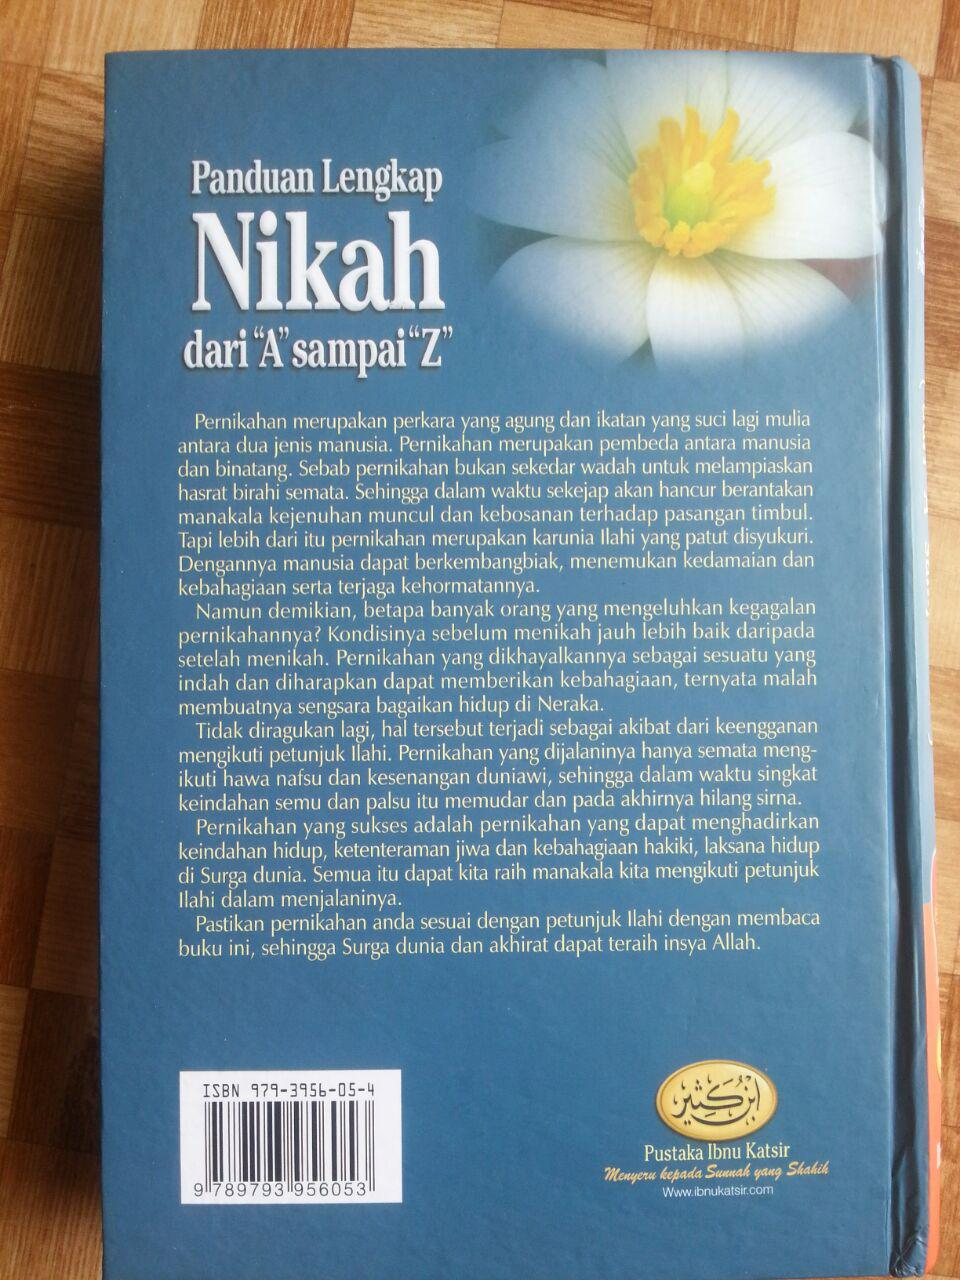 Buku Panduan Lengkap Nikah Dari A Sampai Z cover